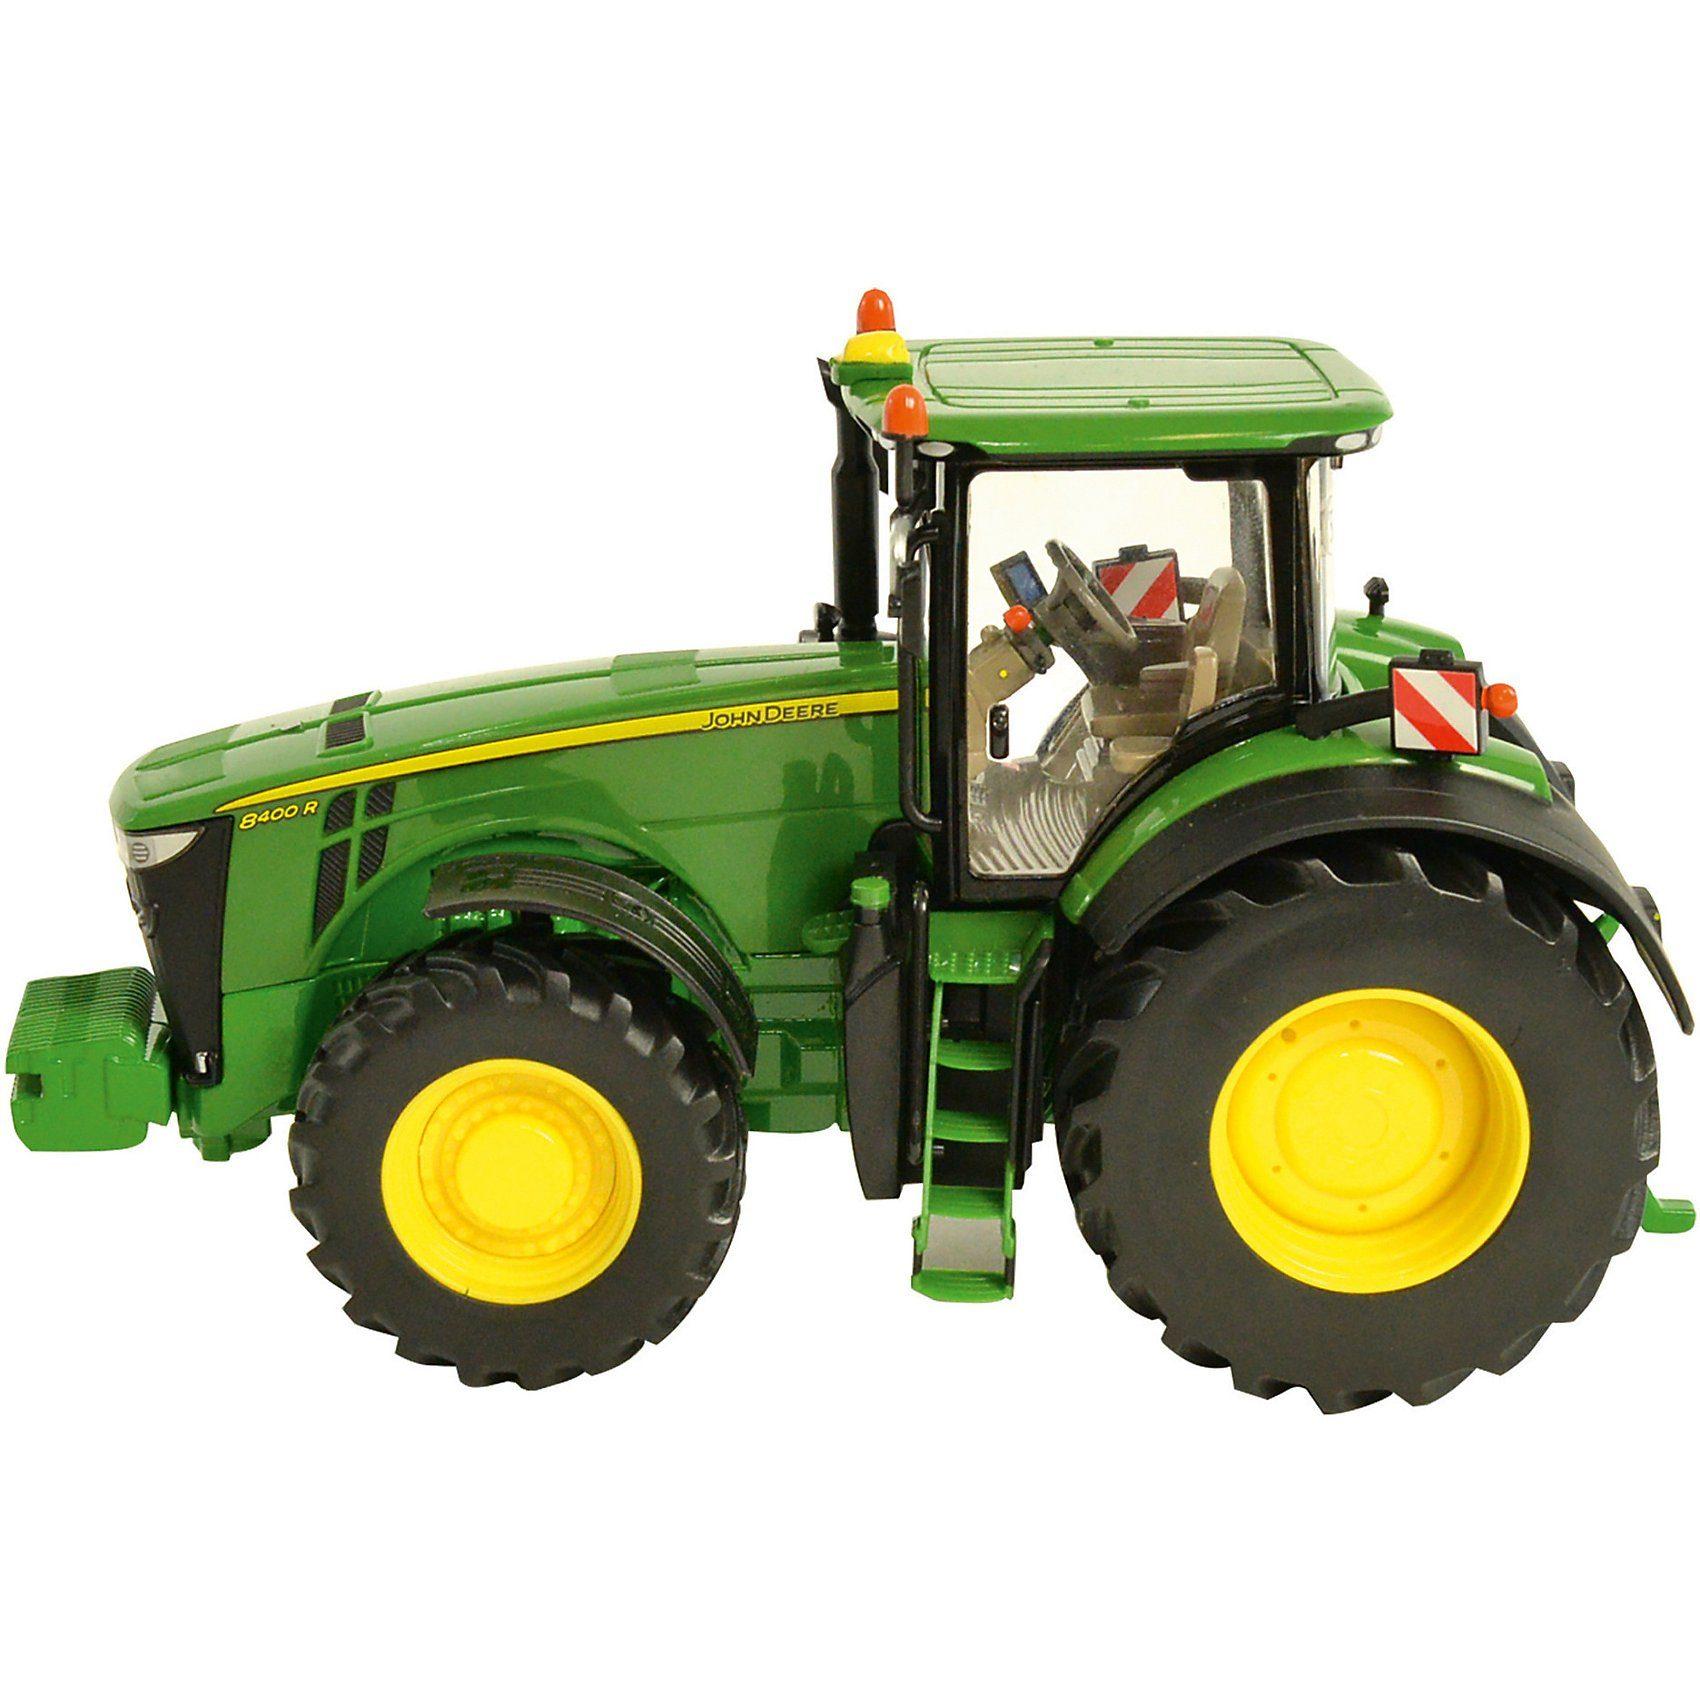 Tomy® Britains John Deere - 8400R Traktor 1:32